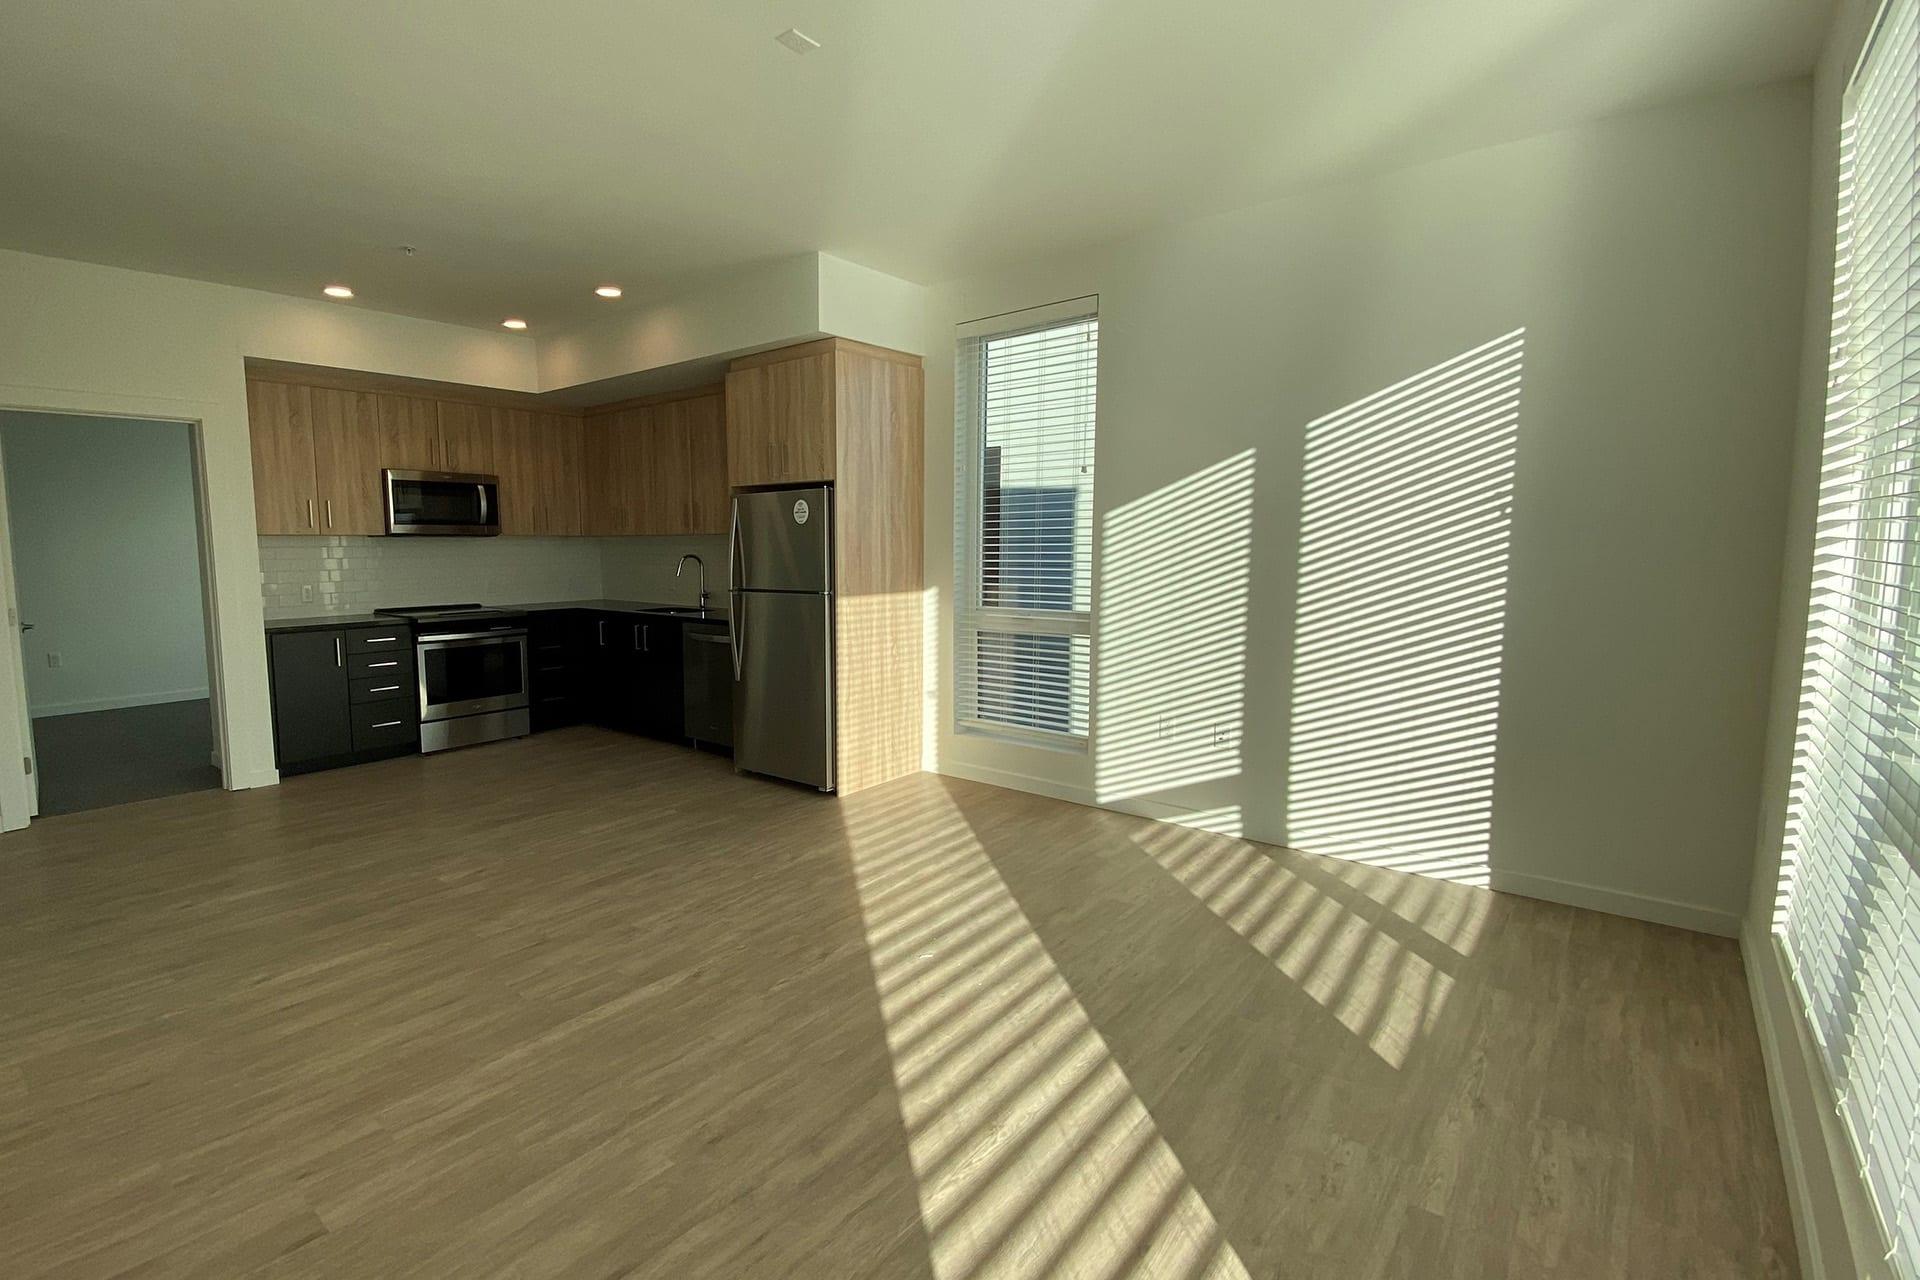 b1_kitchenandliving2x2